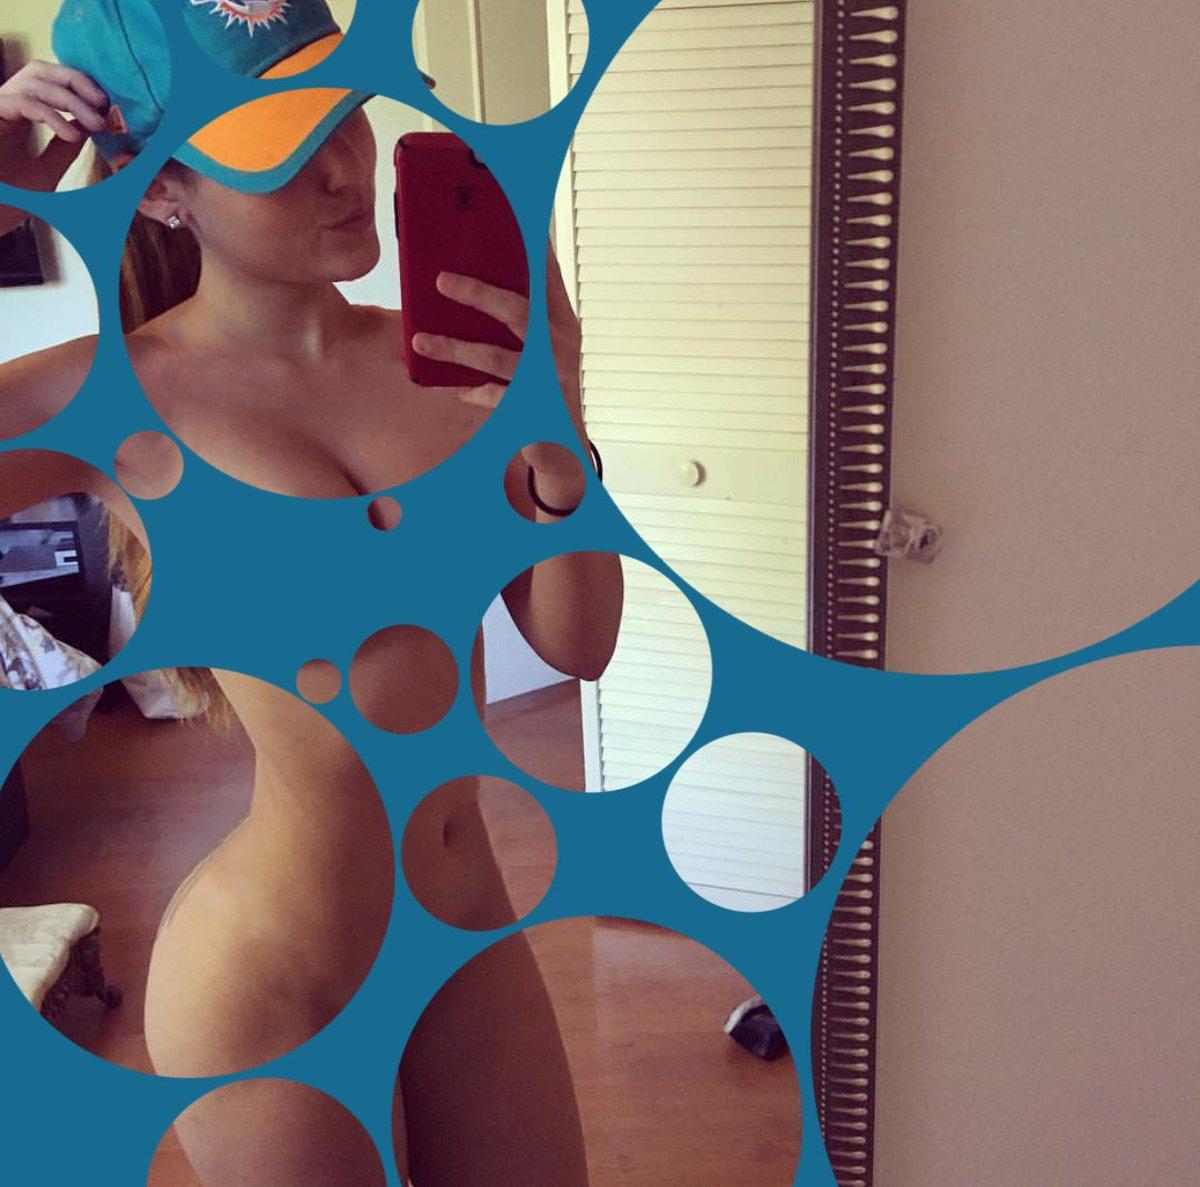 Nude Selfie 7985